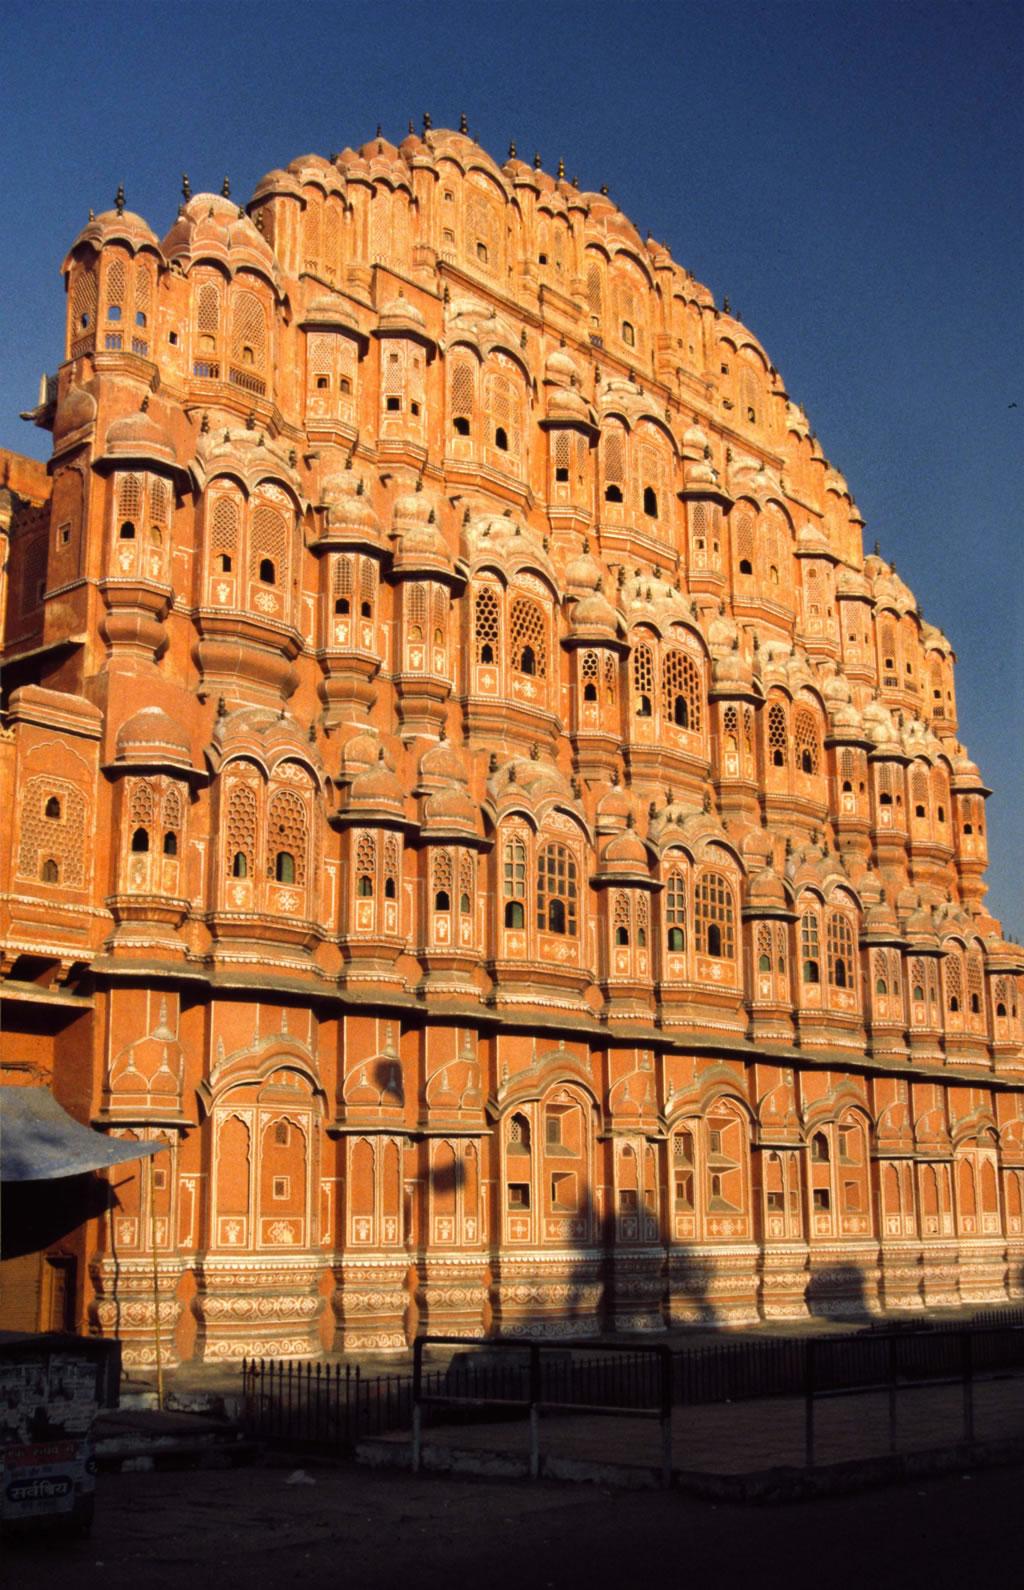 Wallpaper World: Rajasthan Visited by Jaipur